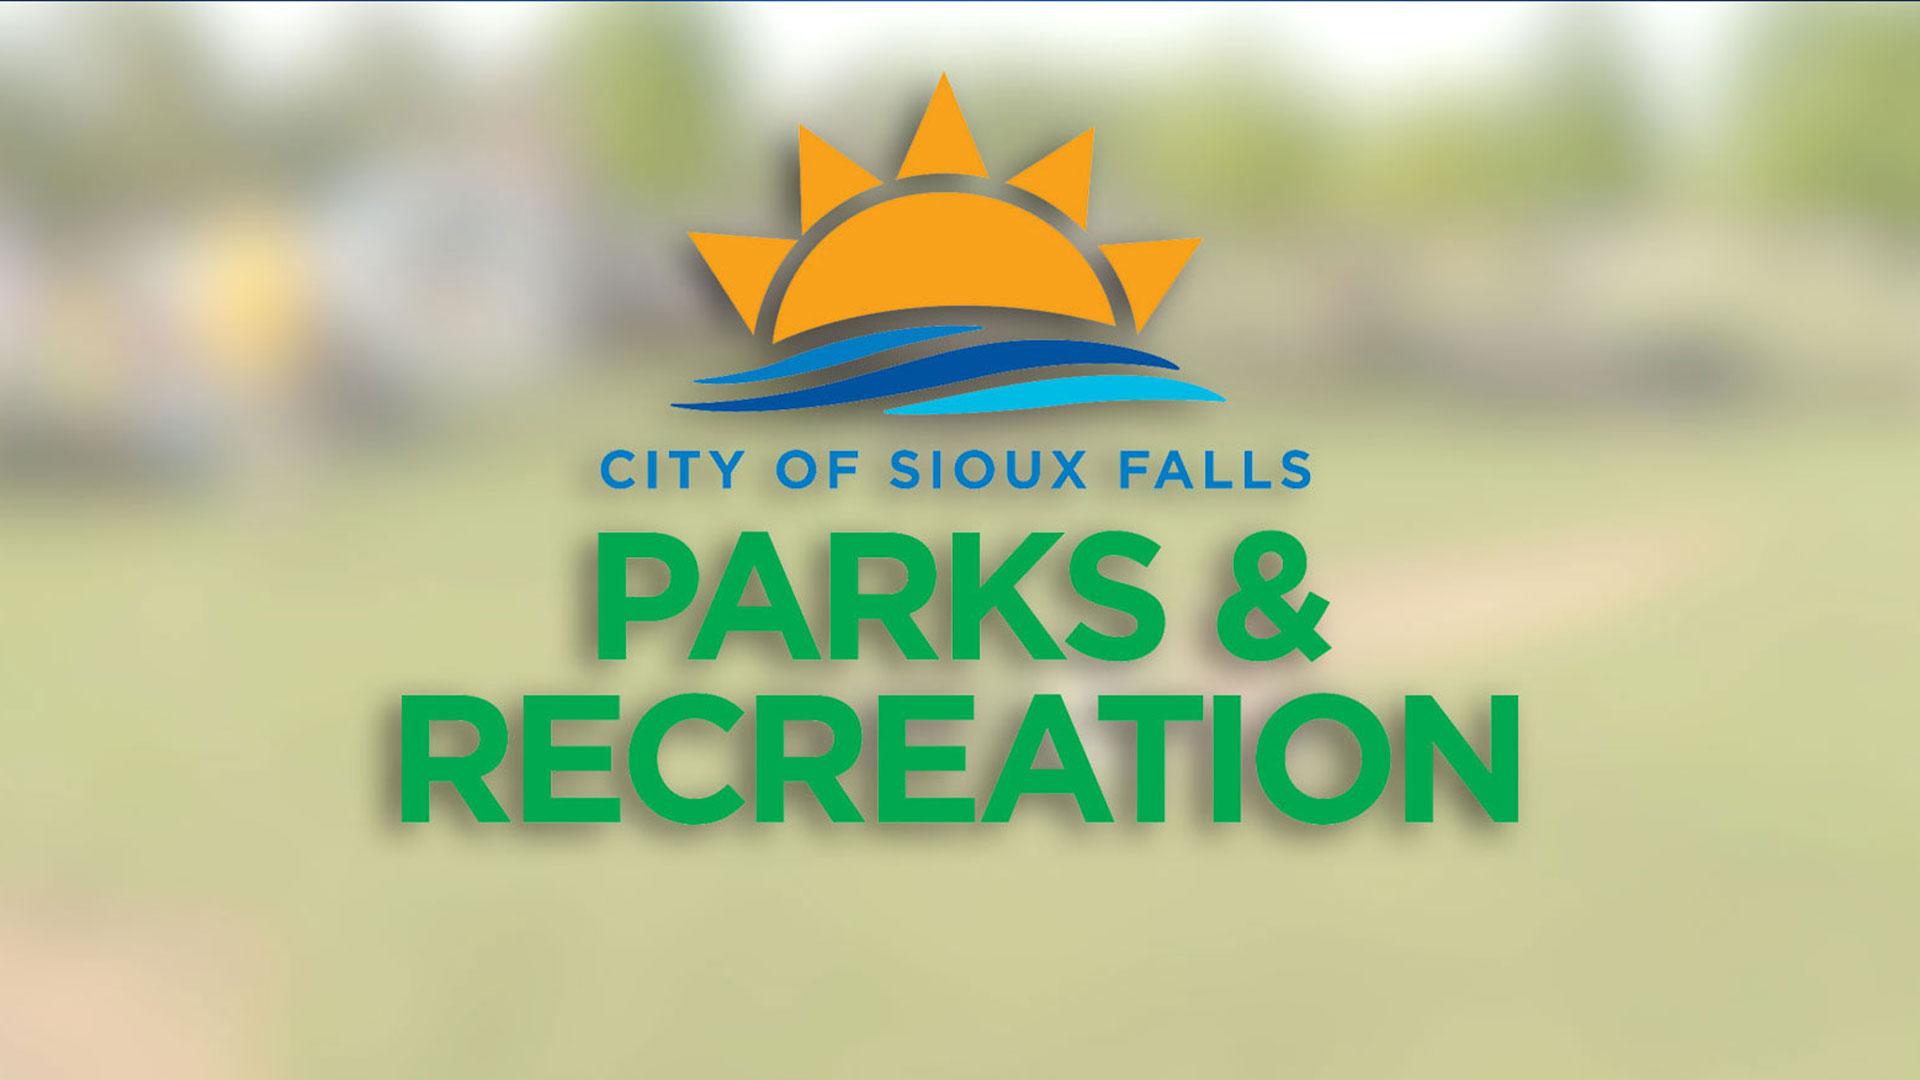 KELO Sioux Falls Parks & Recreation logo